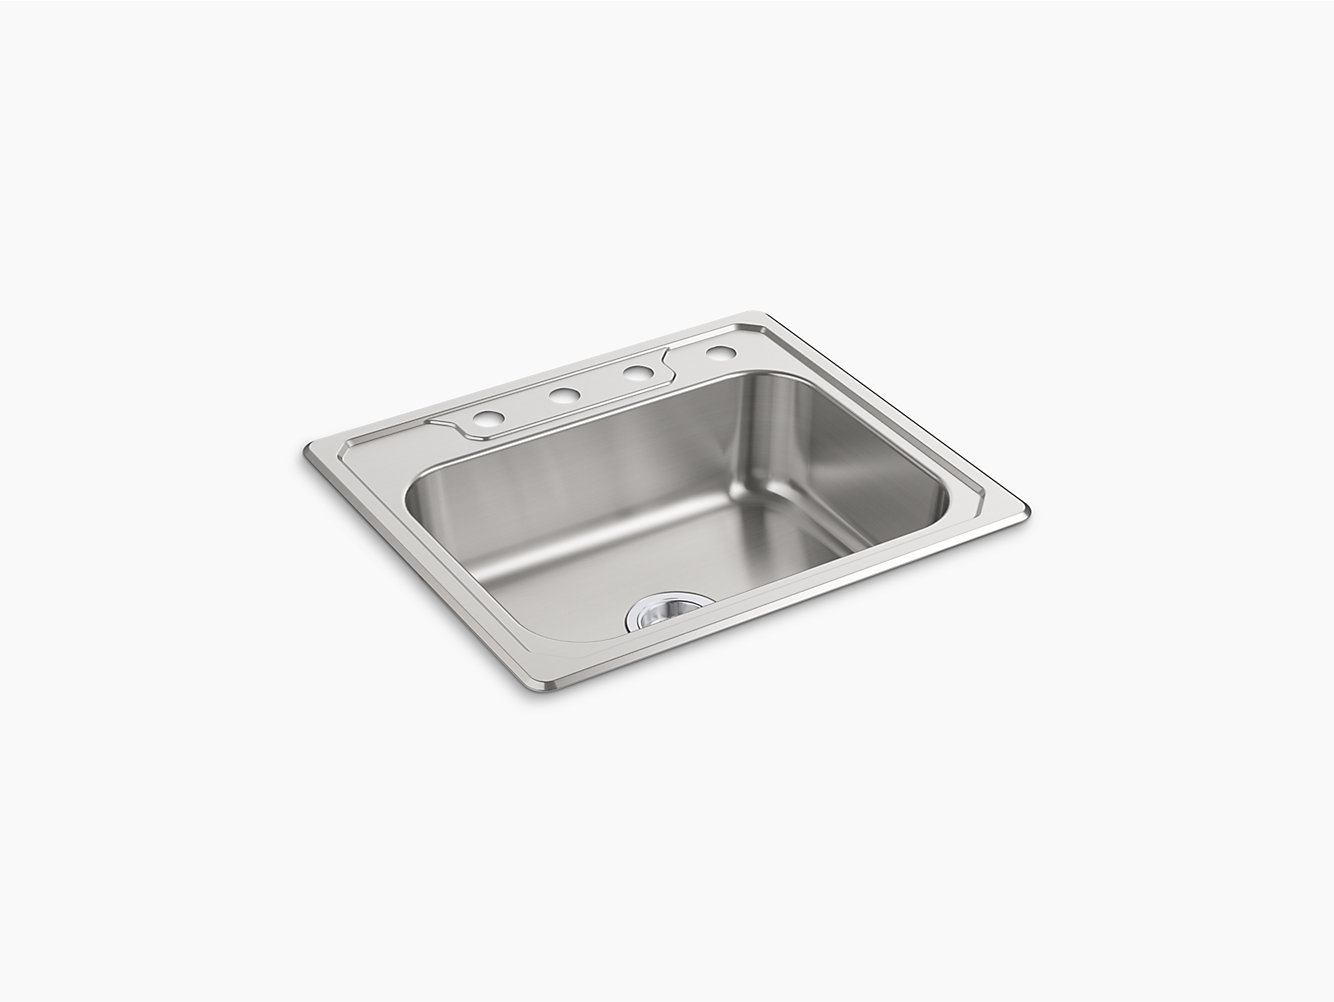 Middleton single basin kitchen sink 25 x 22 x 7 f14710 4 na middleton single basin kitchen sink 25 x 22 x 7 f14710 4 na sterling workwithnaturefo